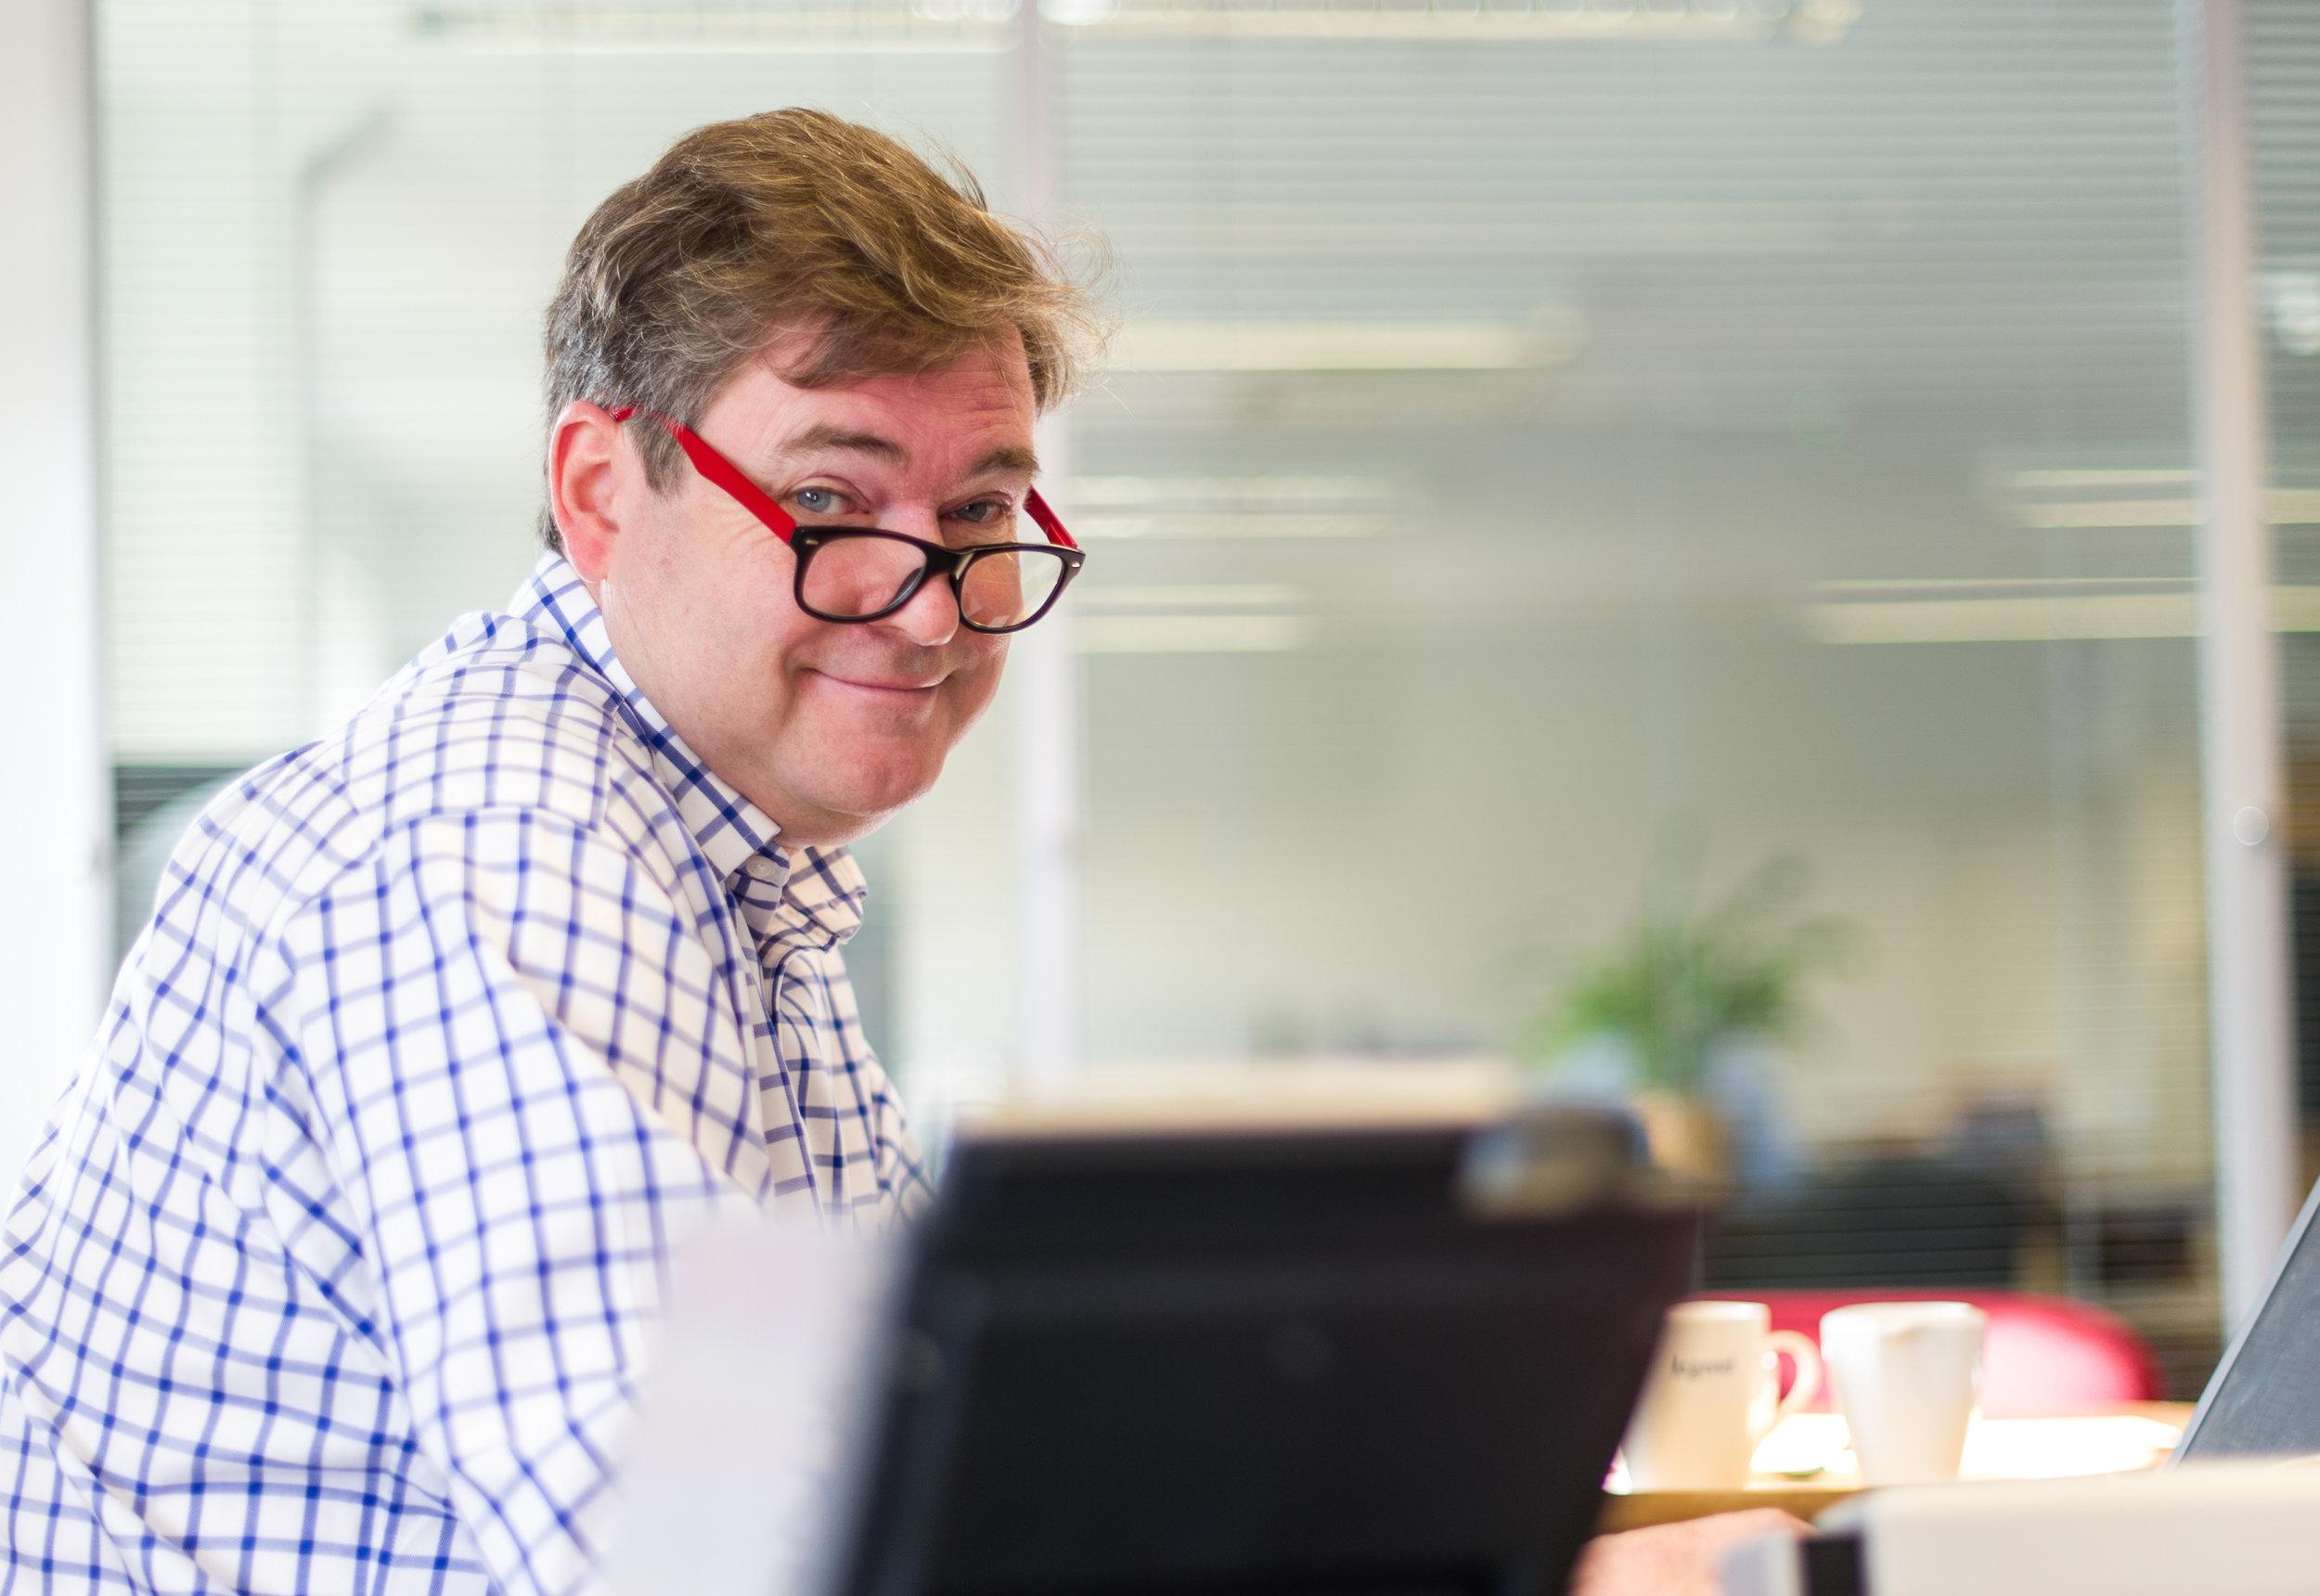 Stephen Smallwood, Managing Director of Bridge3 and Thorne Widgery.